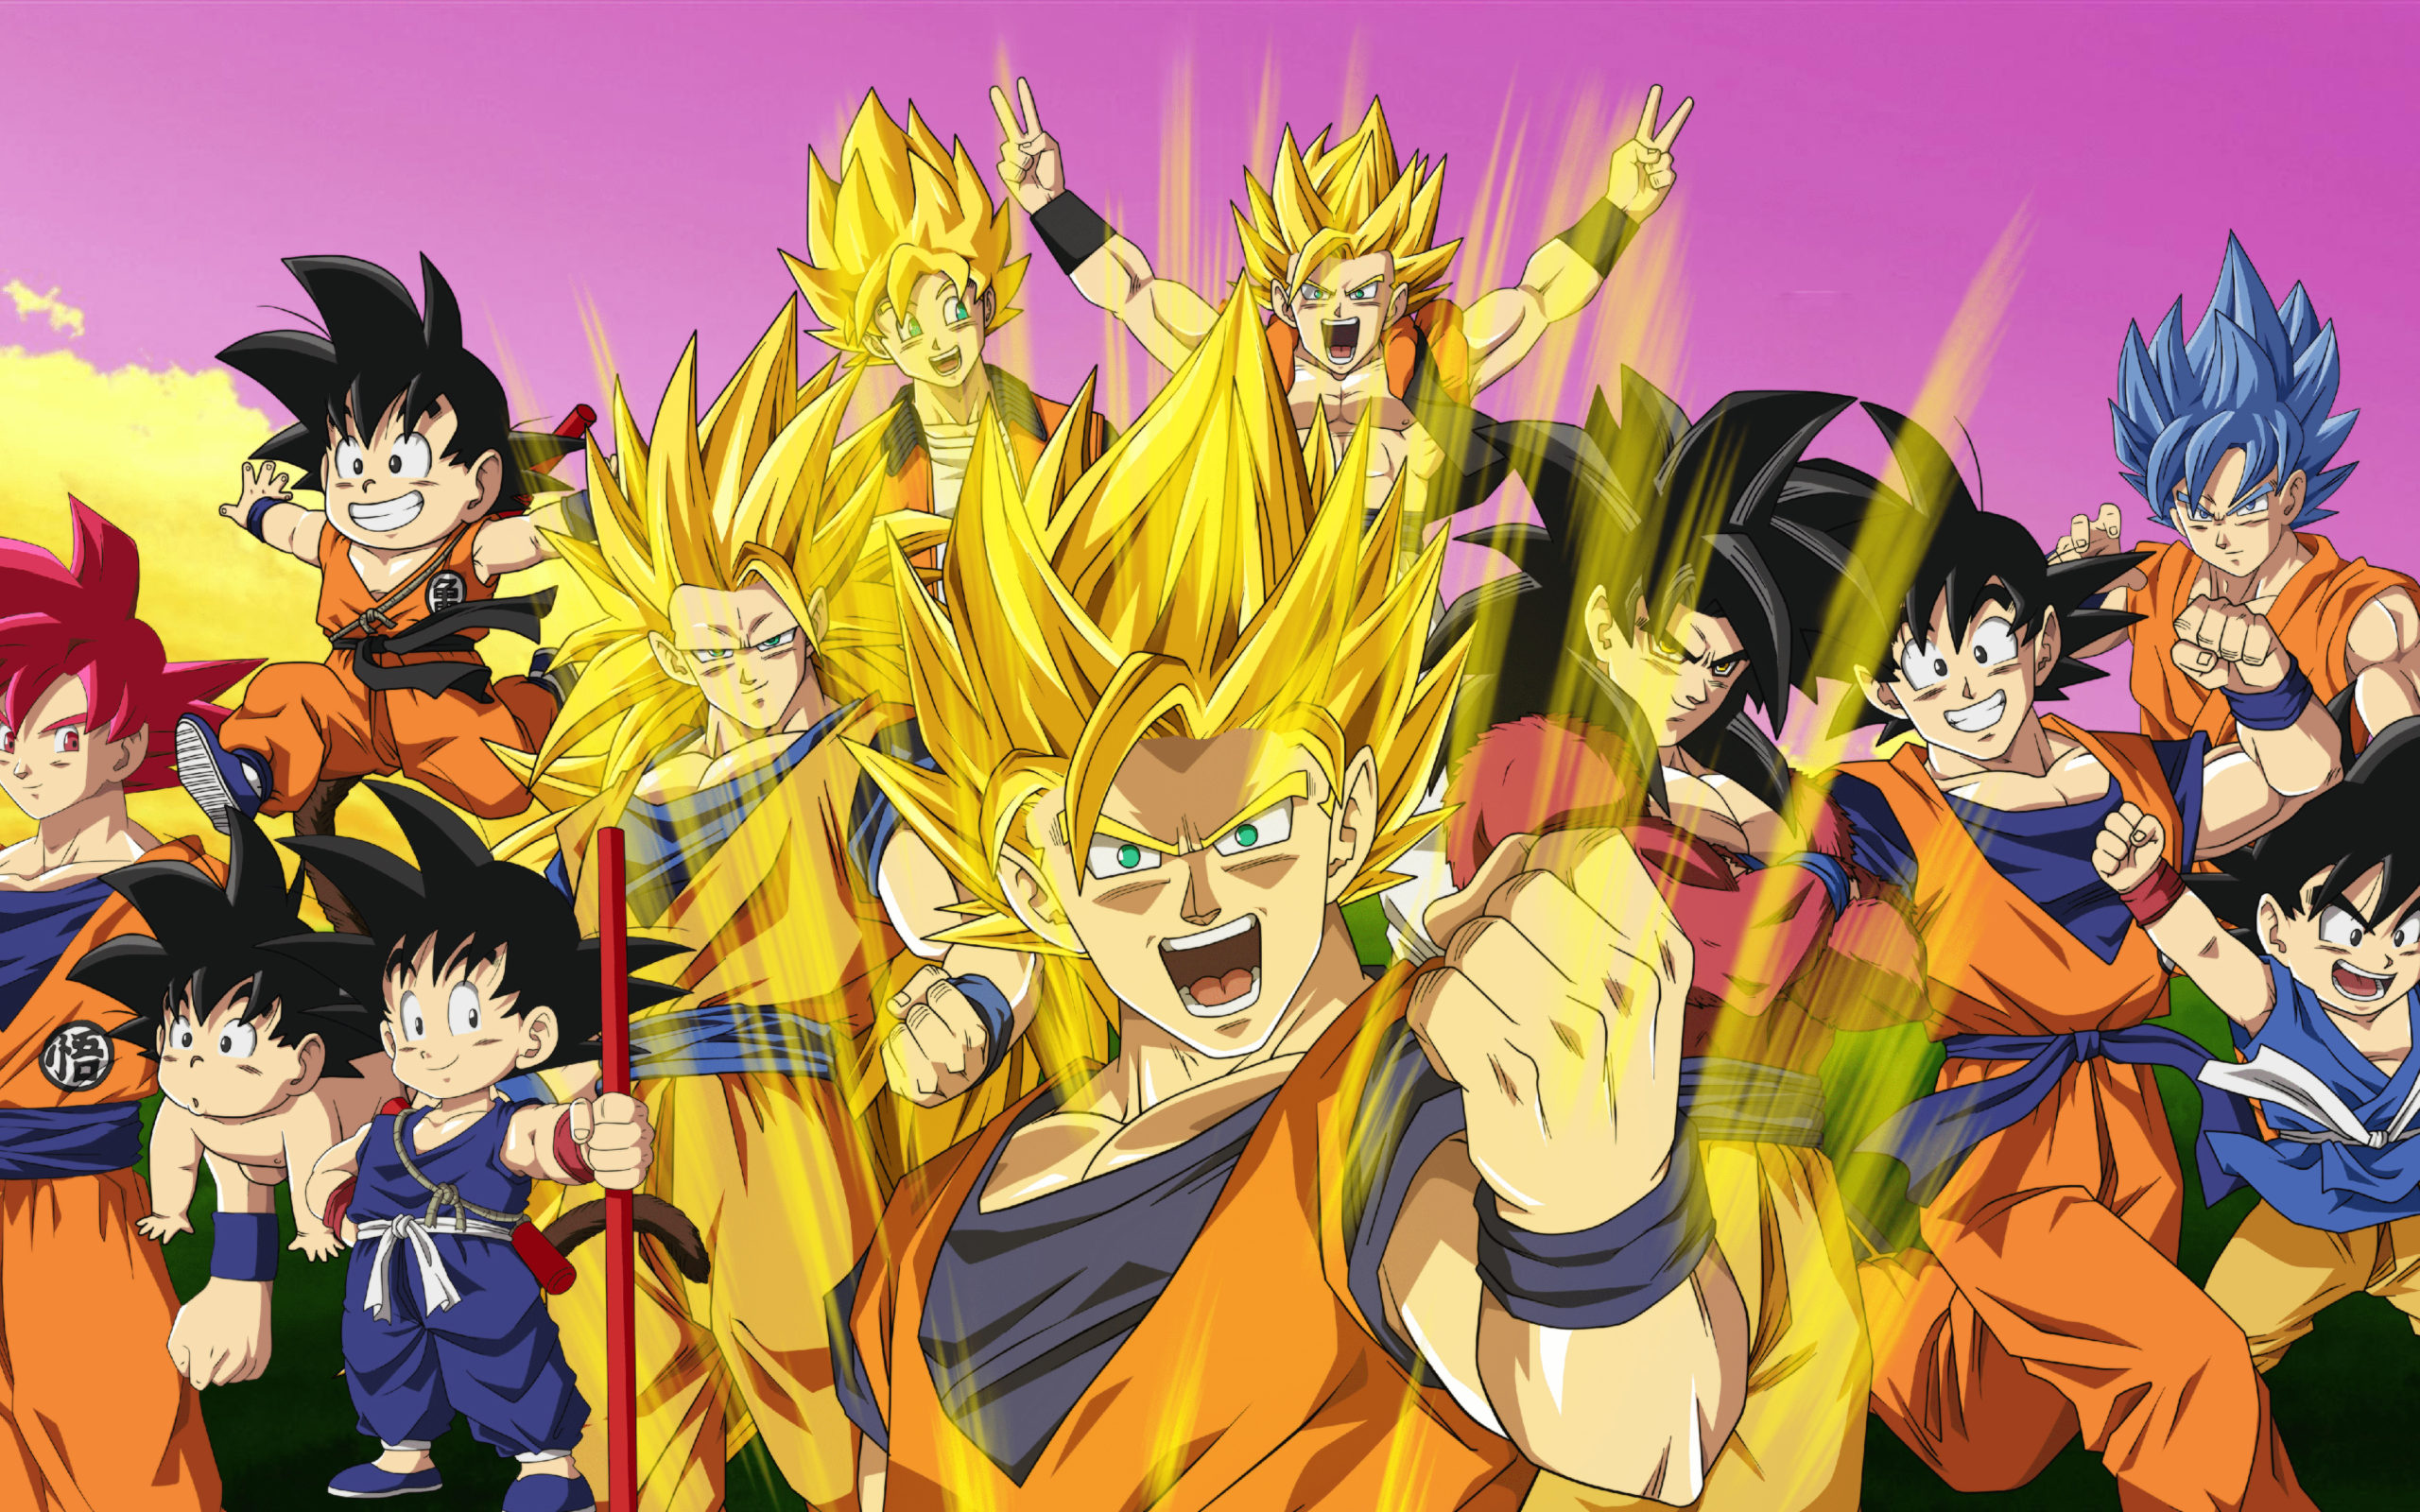 4k-son-goku-all-characters-dbz-dragon-ball-super